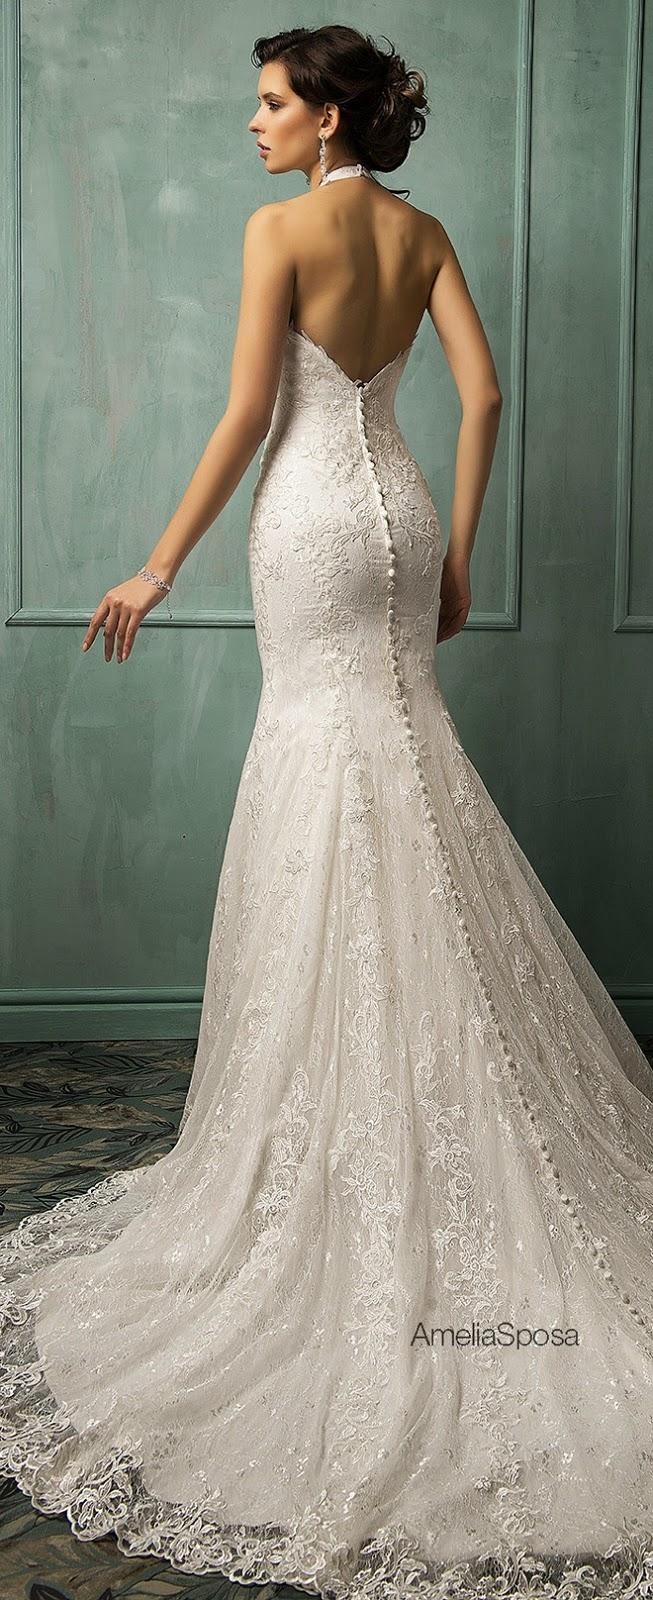 La Sposa Wedding Dresses 94 Cute UPDATE Amelia Sposa Wedding